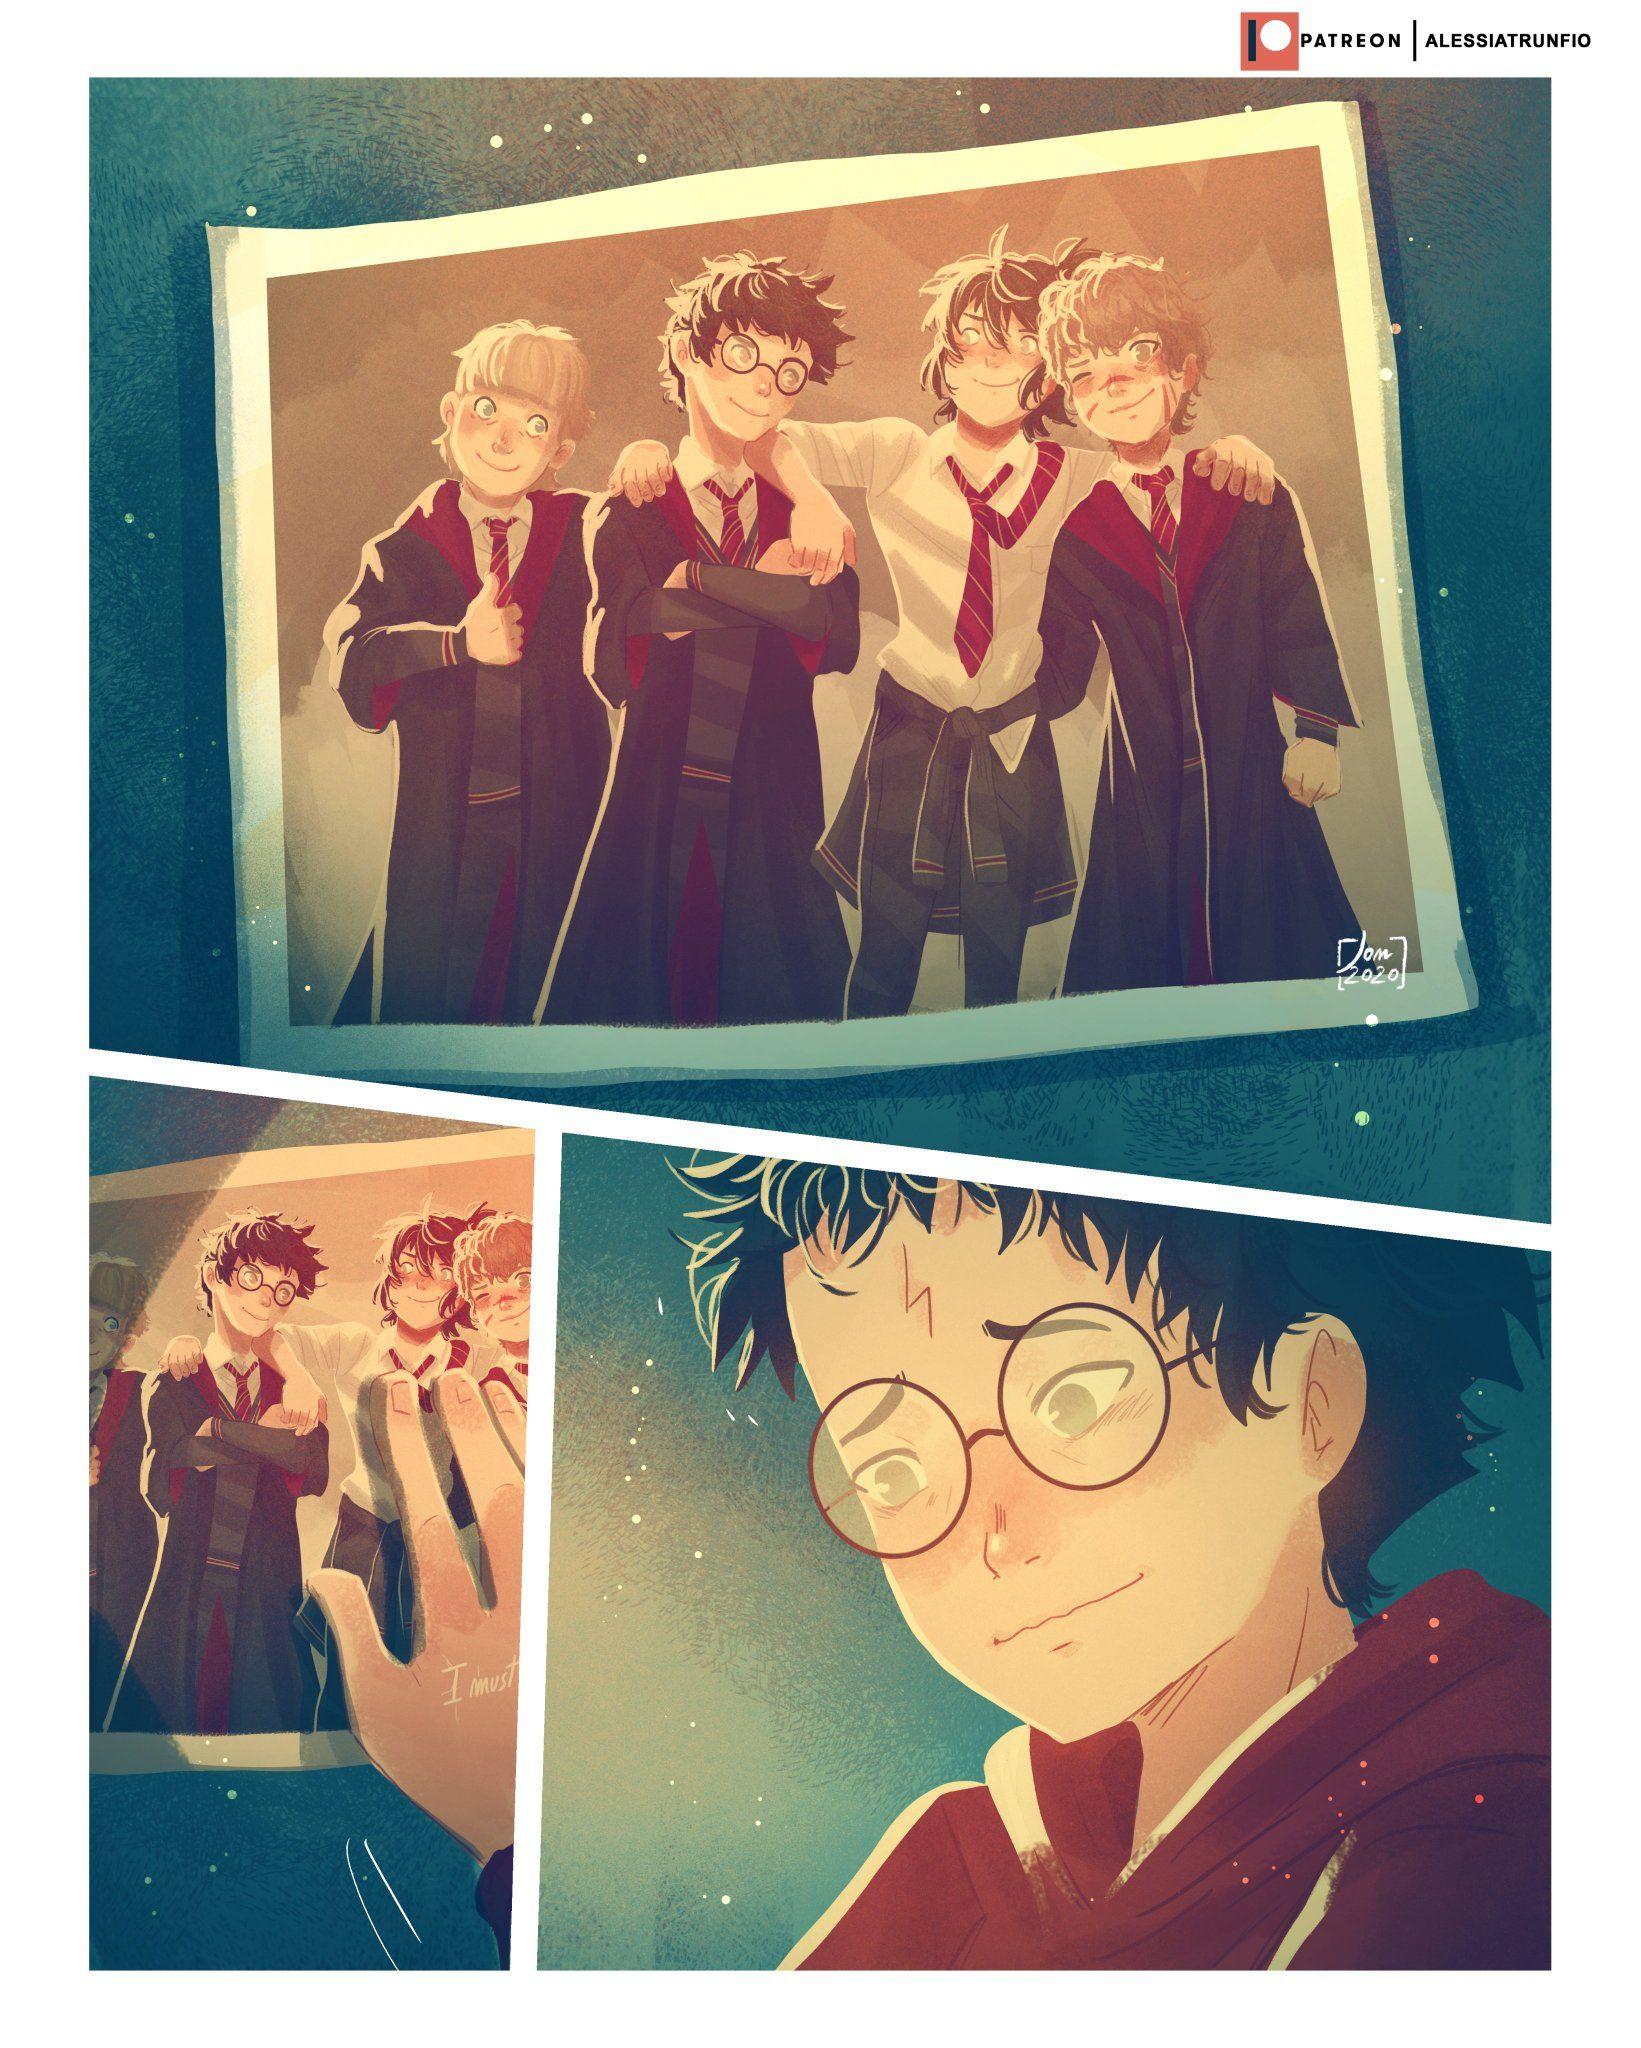 Alessia Trunfio On Twitter Harry Potter Traurig Harry Potter Bilder Harry Potter Comics